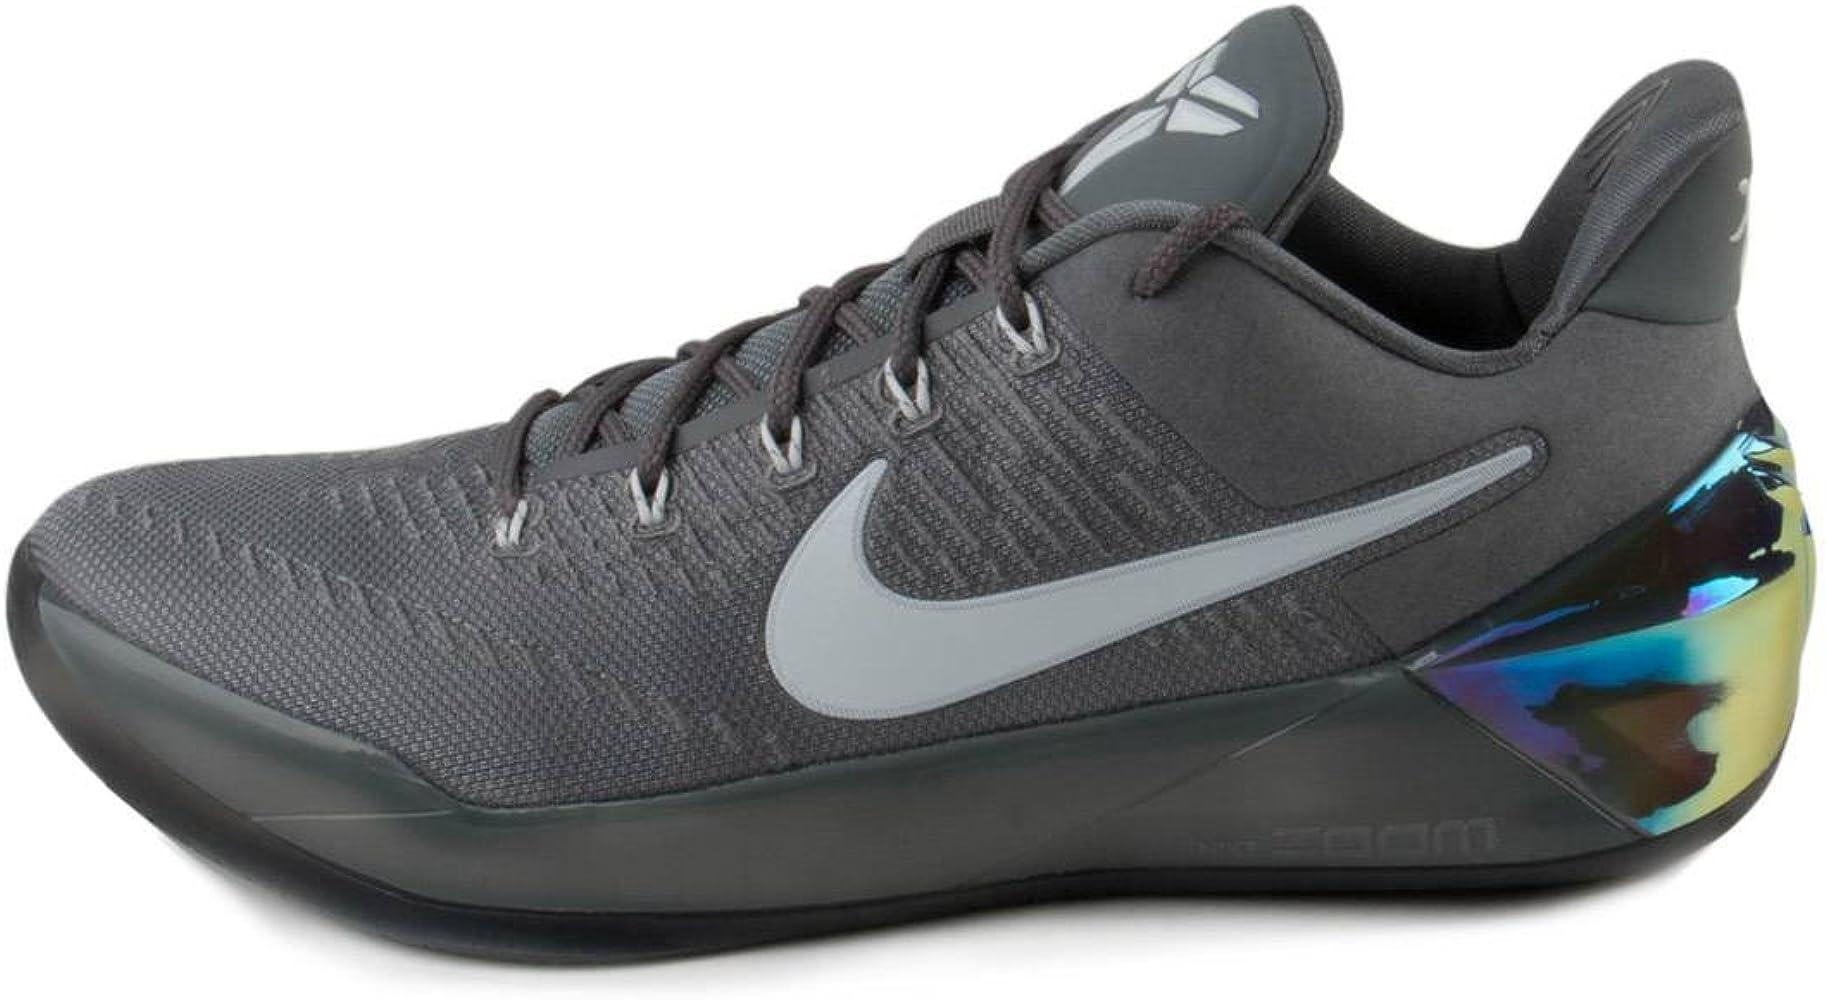 Nike Mens Kobe A.D Cool Grey